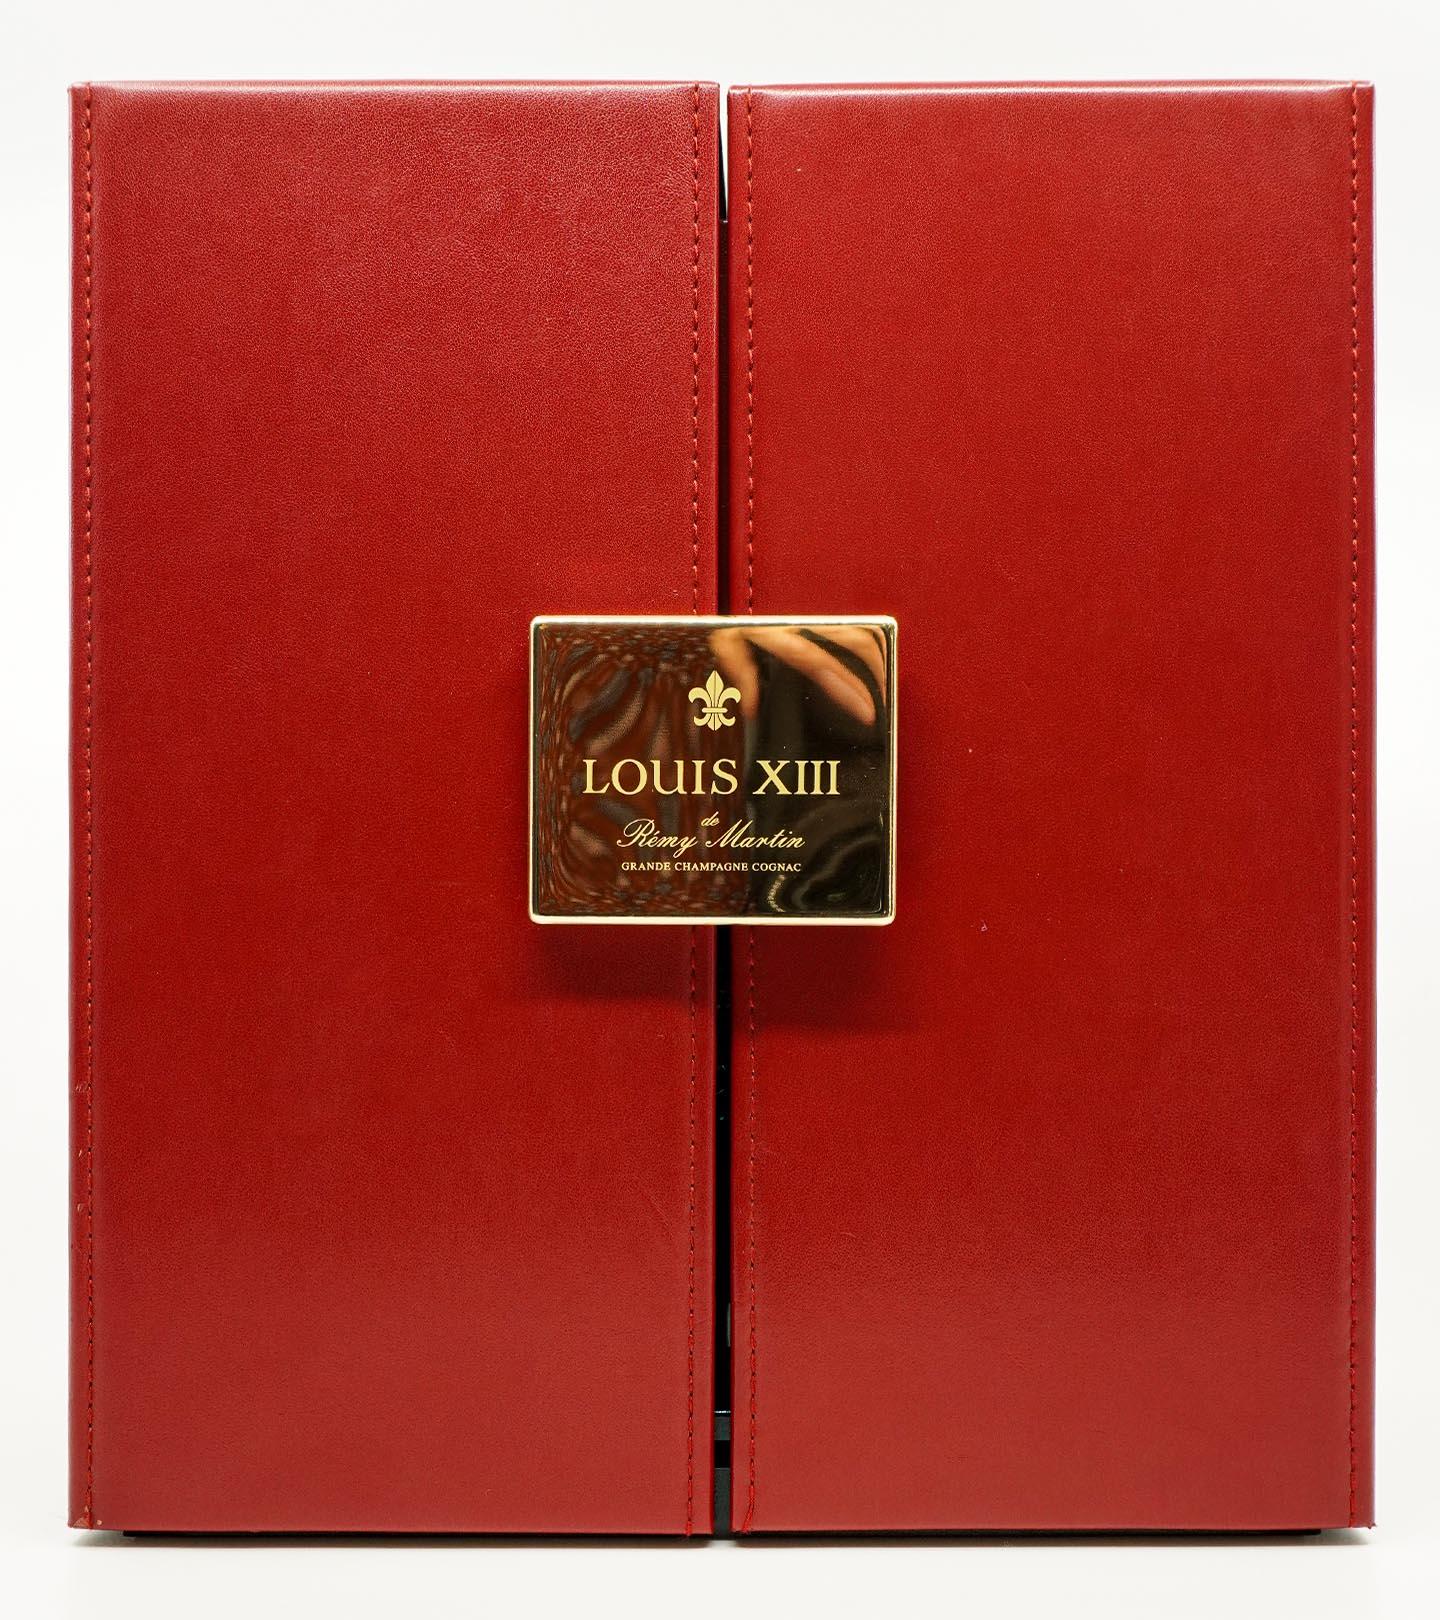 Cognac Rémy Martin Louis XIII 70cl 4